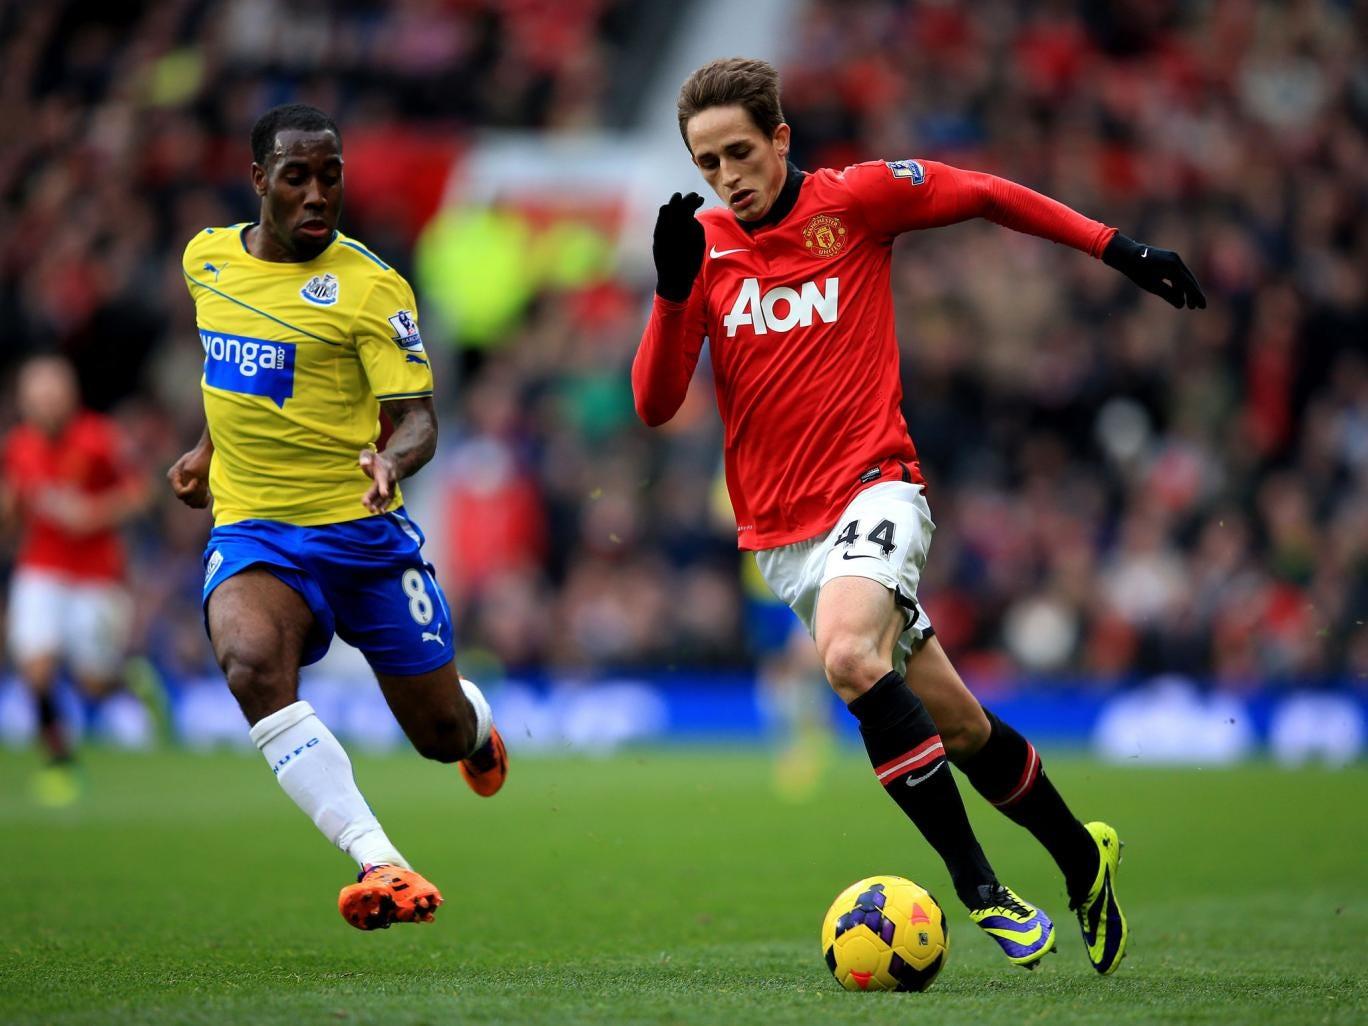 Adnan Januzaj of Manchester United is pursued by Vurnon Anita of Newcastle